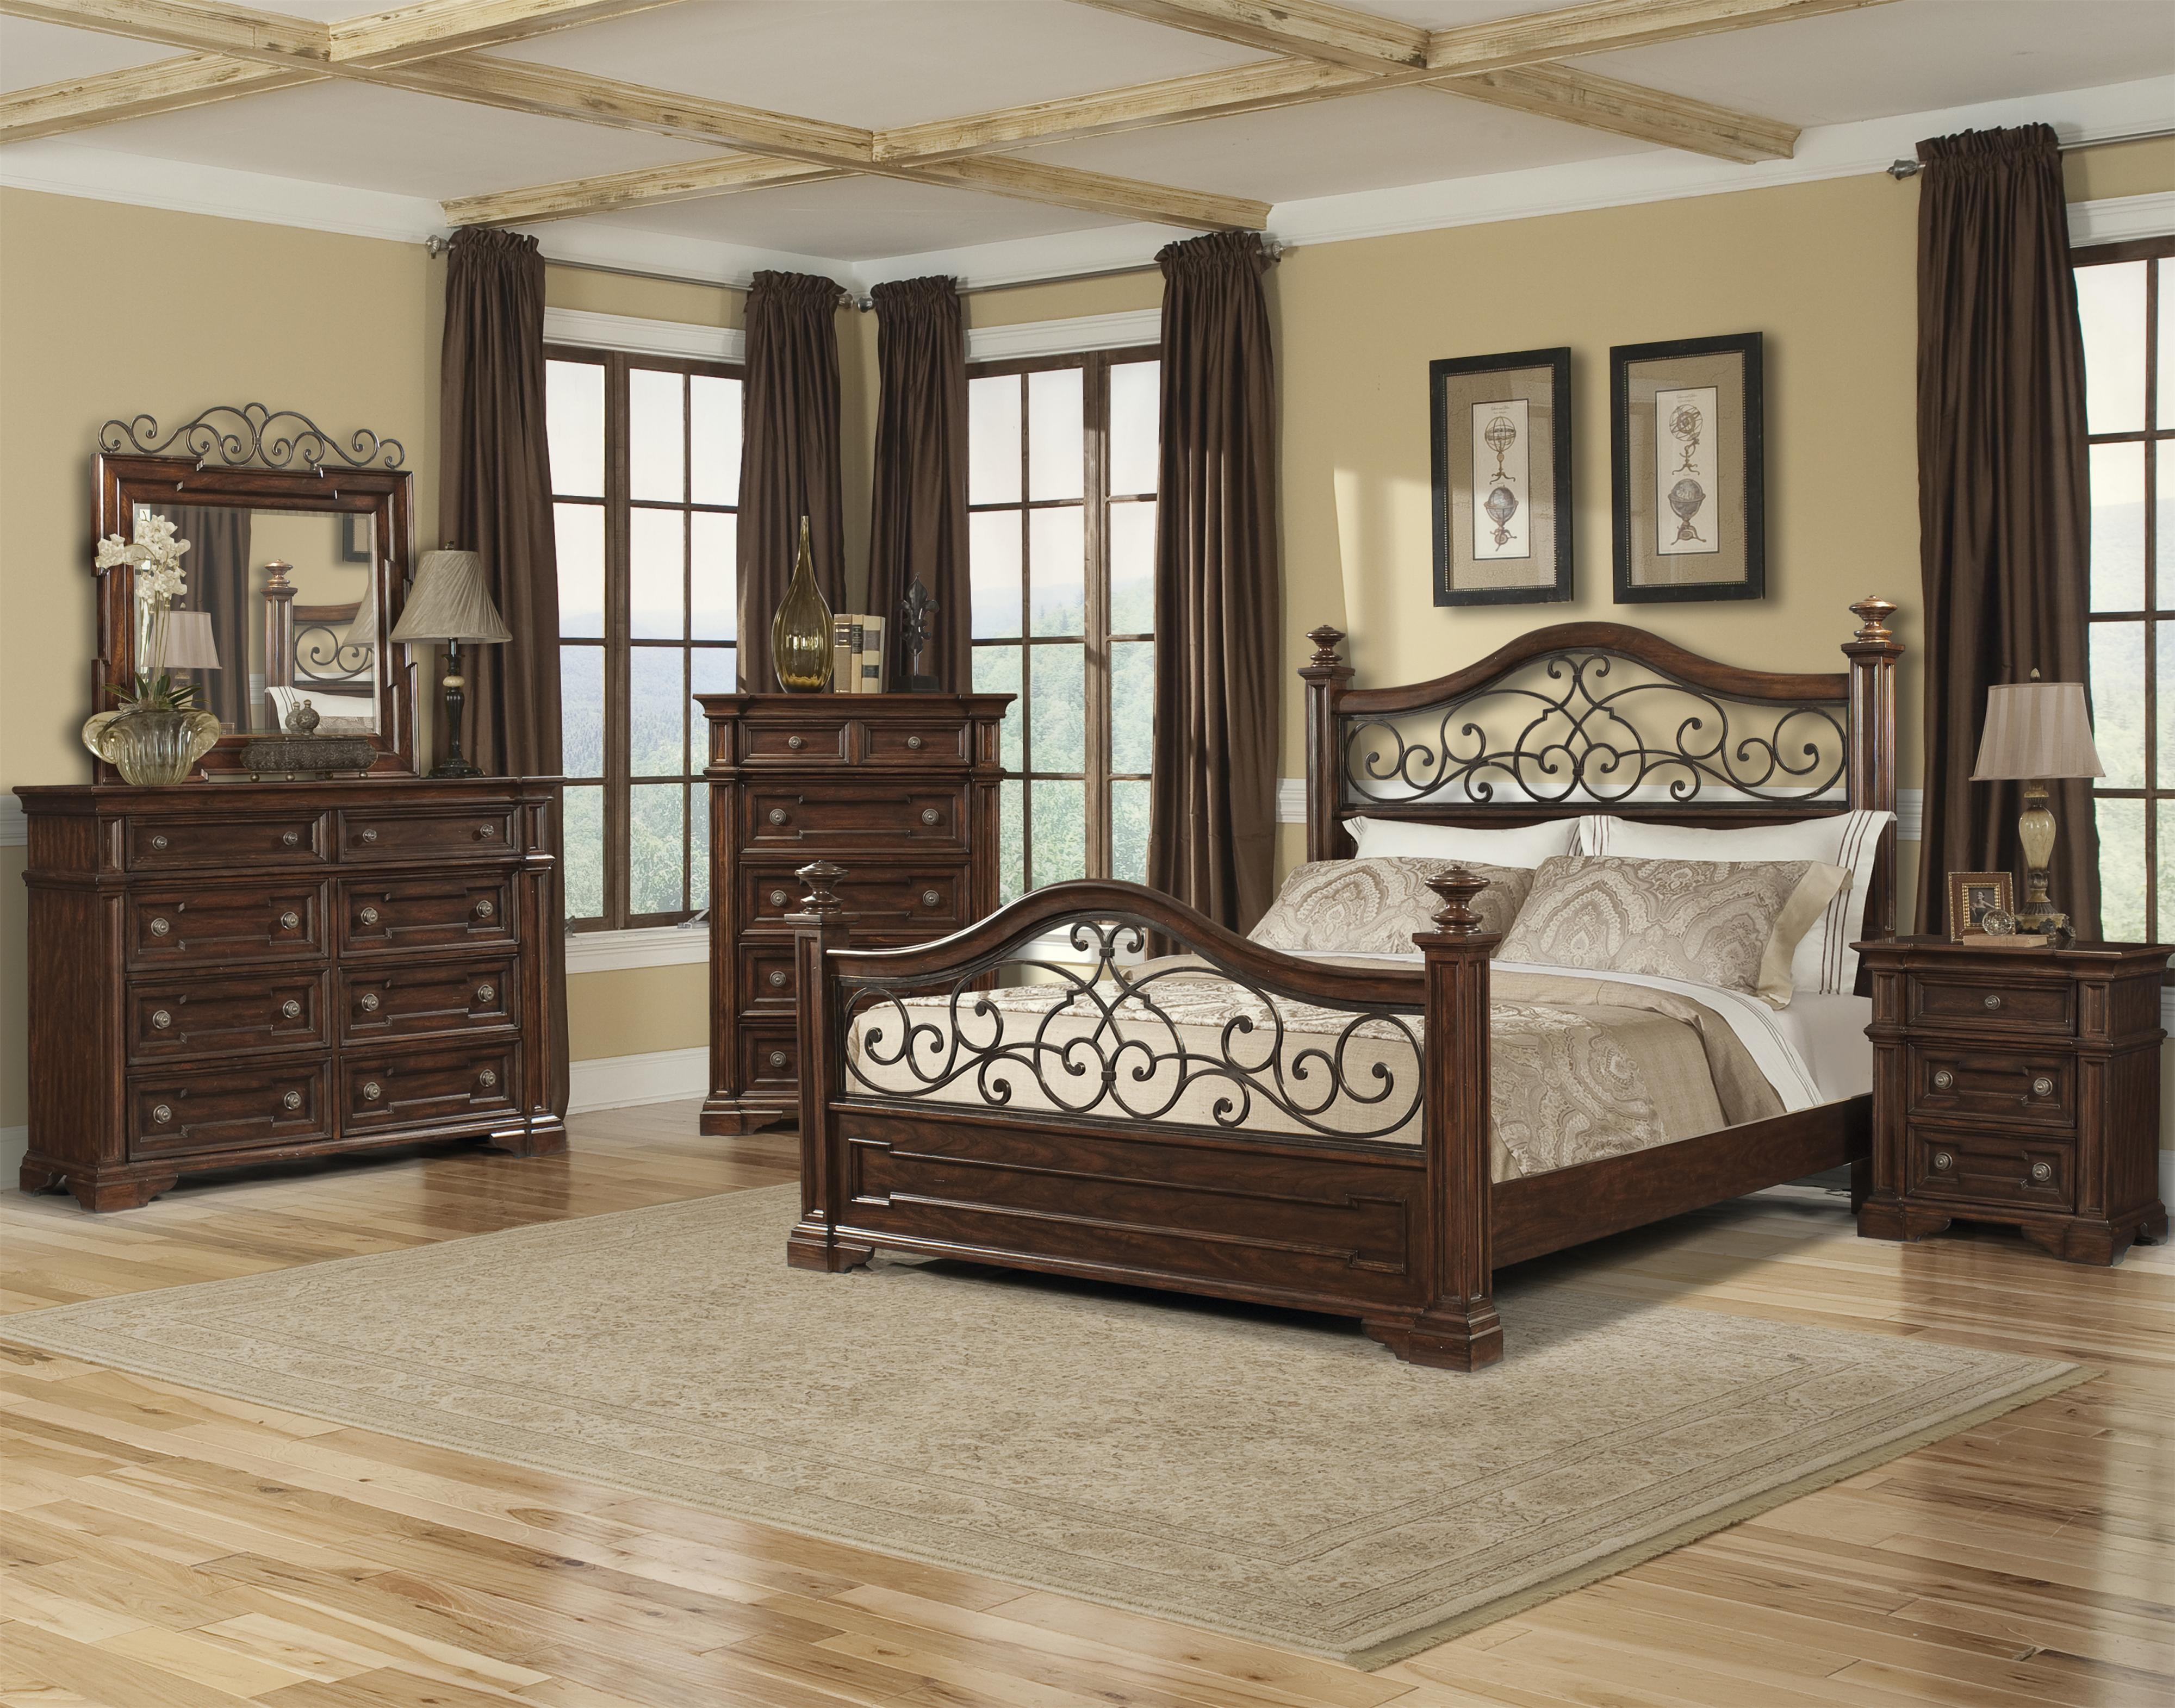 Klaussner International San Marcos Queen Bedroom Group Wayside Furniture Bedroom Group